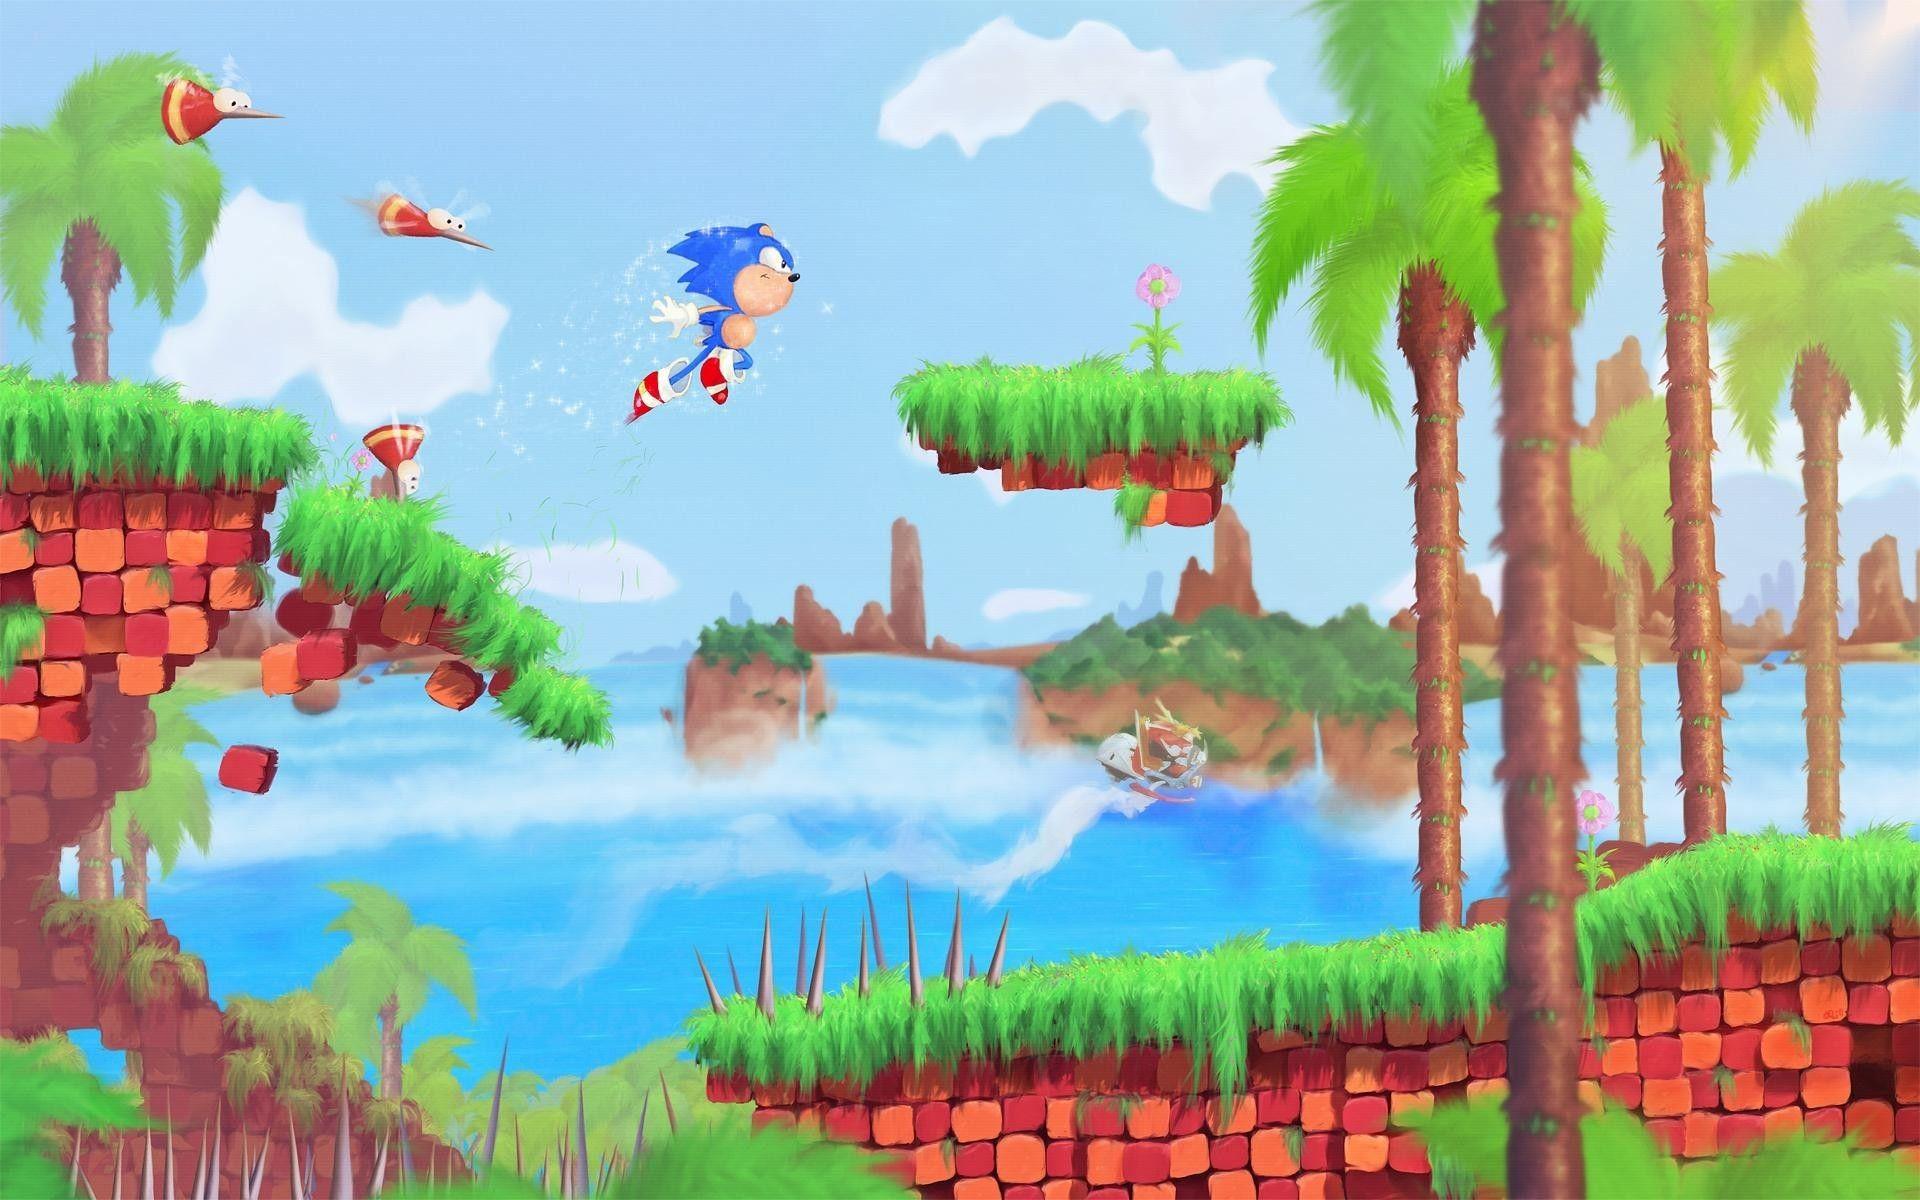 Spikes Digital Art Artwork Retro Sega Sea Wallpaper Sonic Fotos Gigantes De Acero Retro